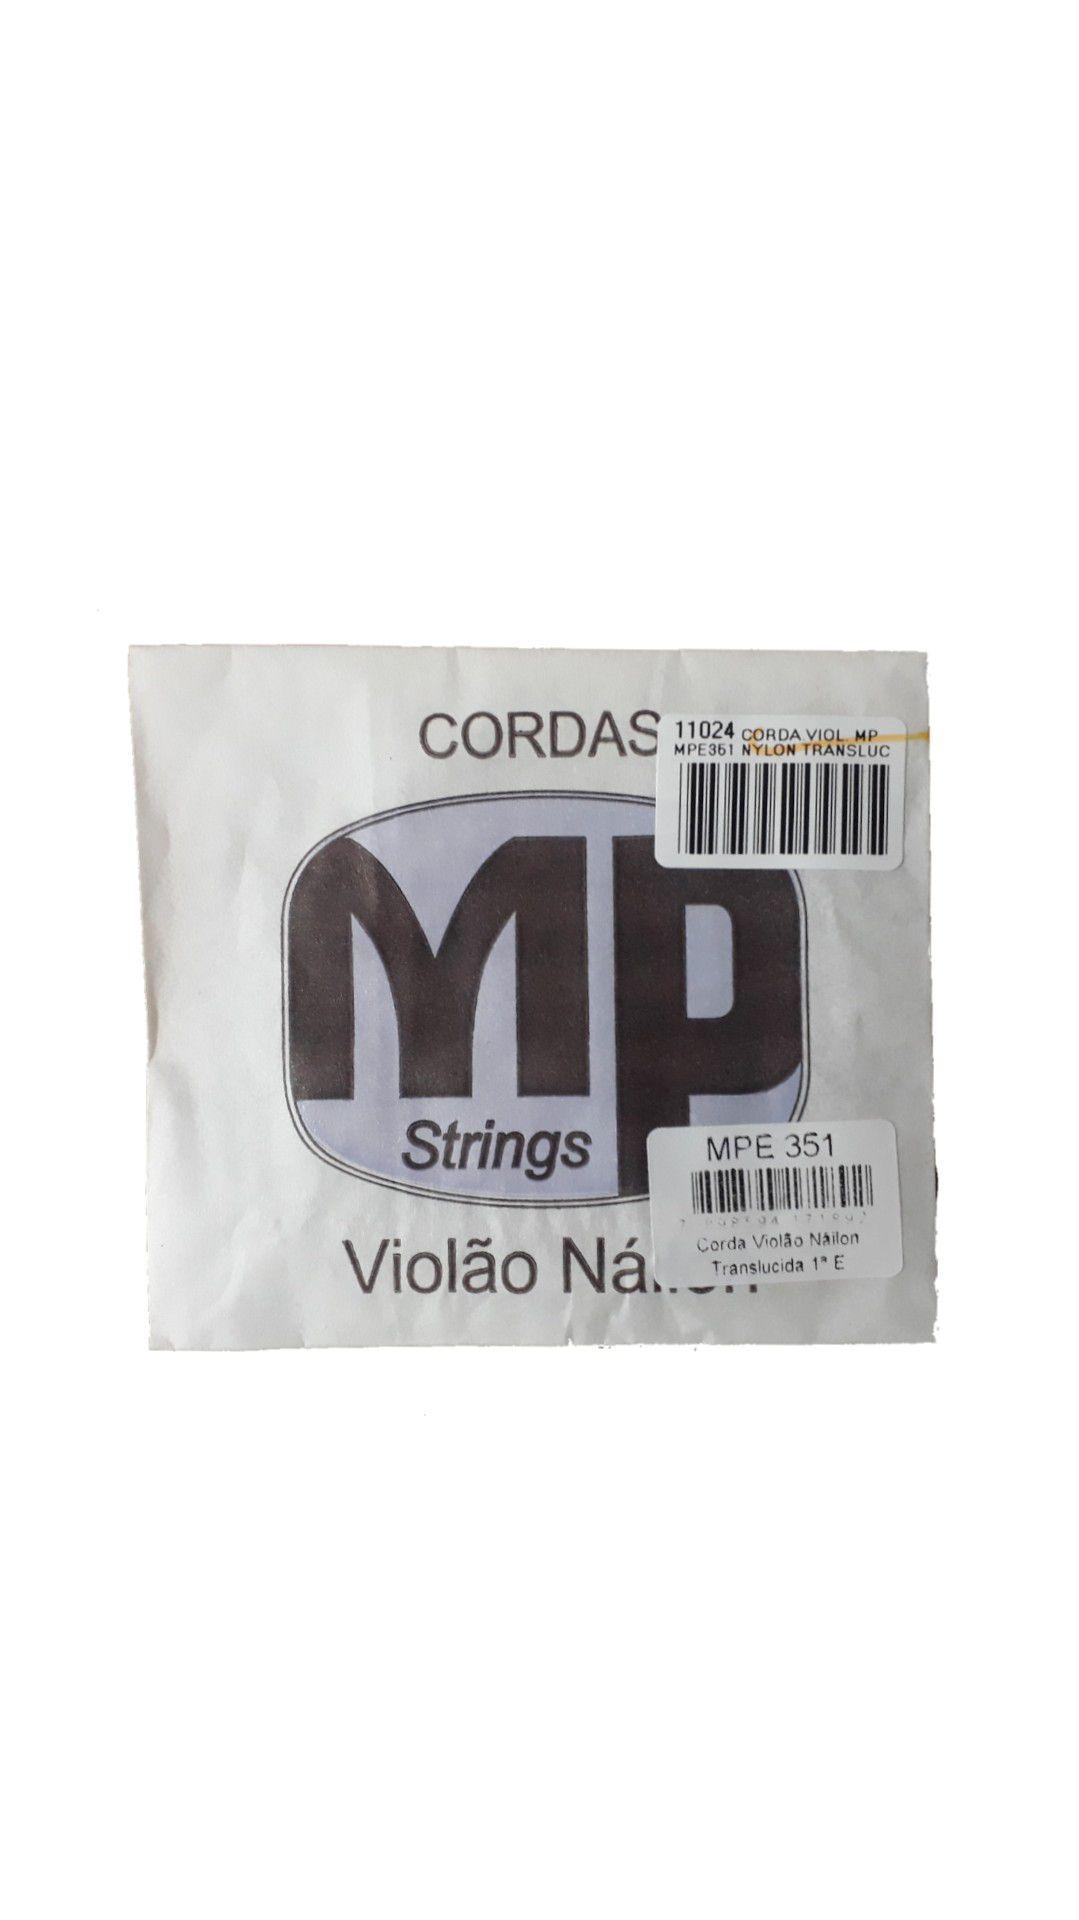 CORDA VIOL. MP MPE351 NYLON TRANSLUCIDA 1ª E/MI C/BOLINHA